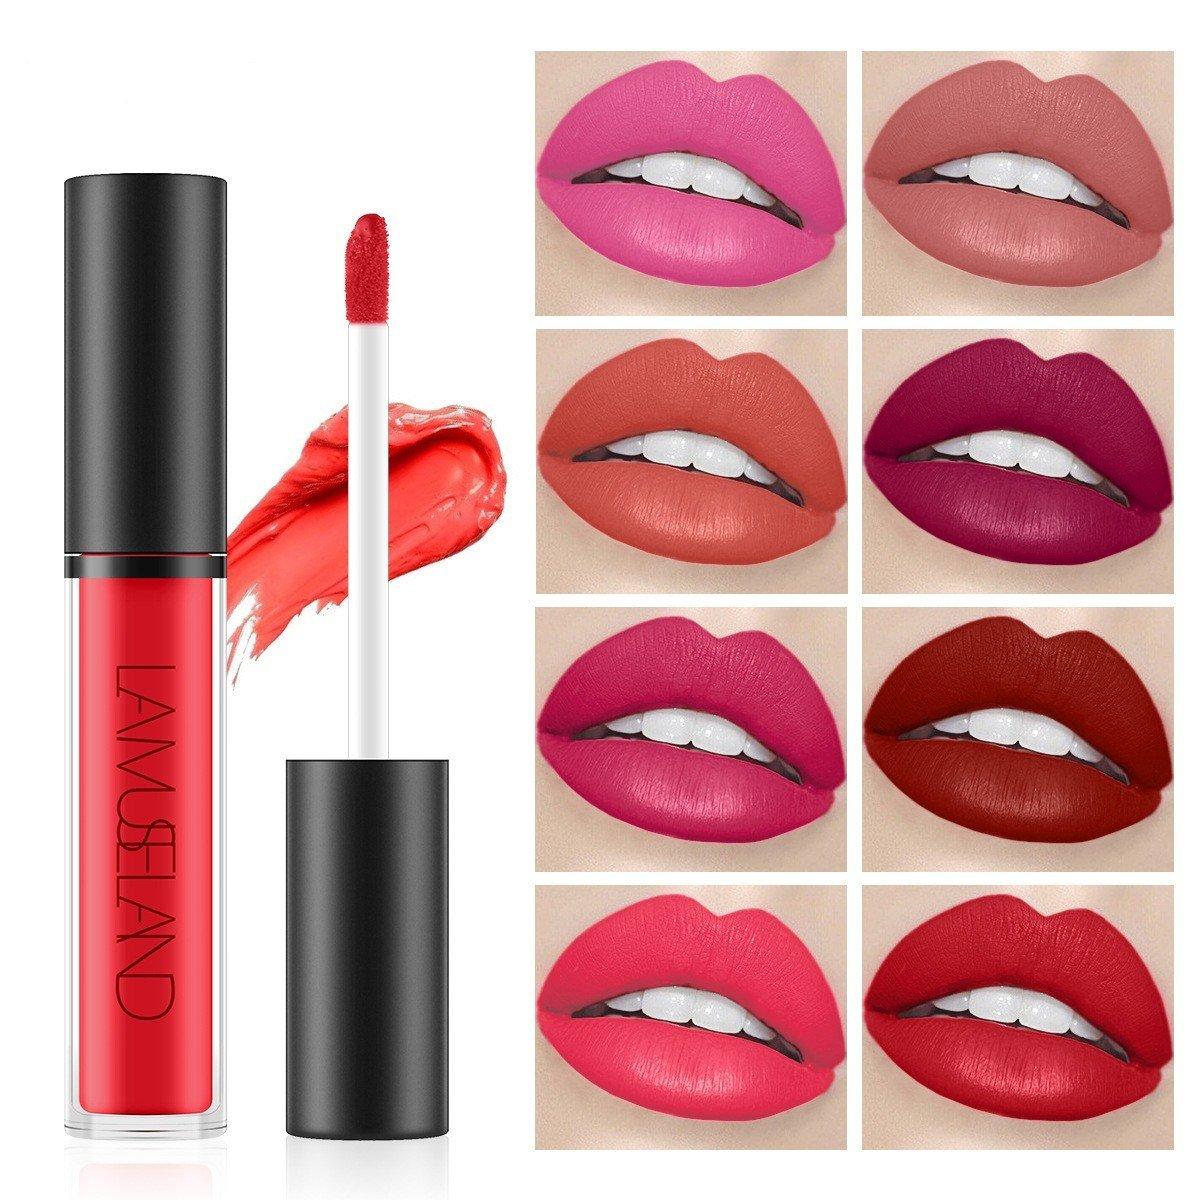 12 Colors Lip Gloss Long-Lasting Waterproof Non-Stick Cup Liquid Lipstick Lip Makeup